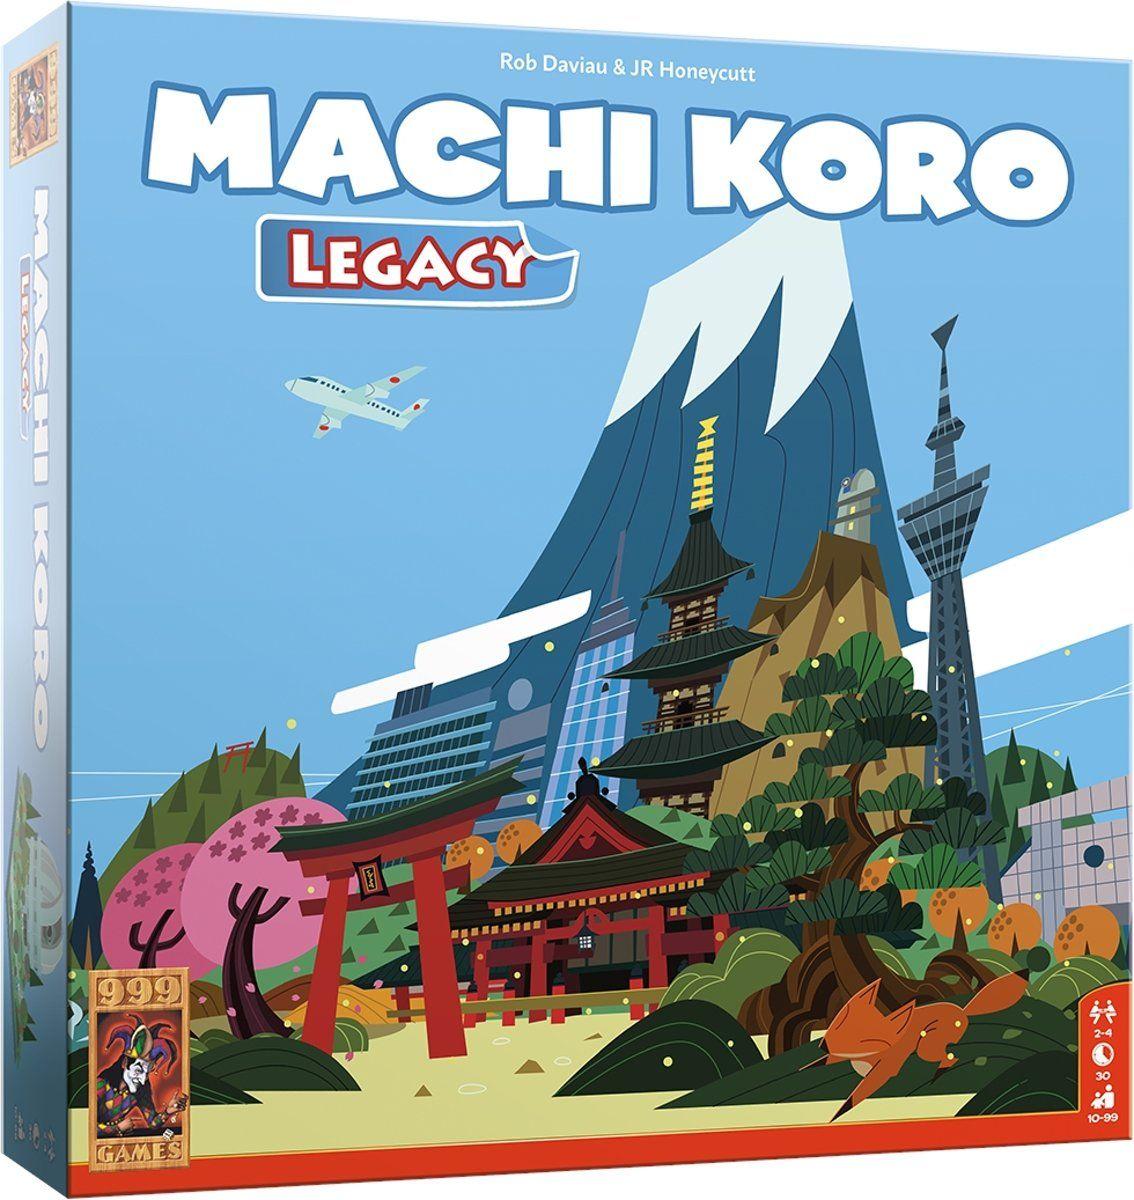 Machi koro legacy outlet aanbieding @ Bol.com